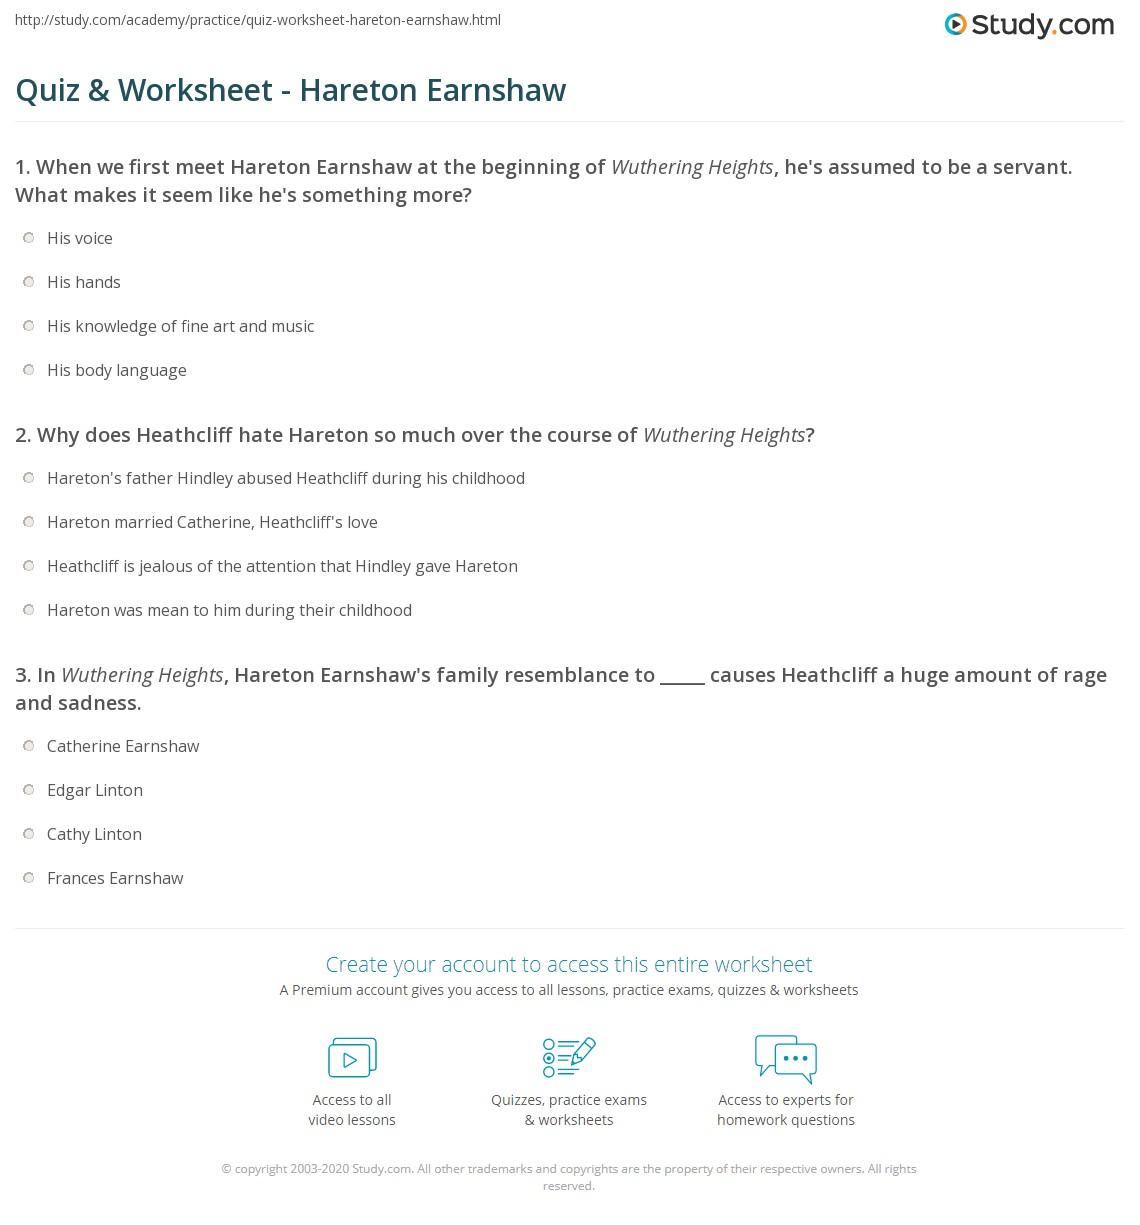 hareton and heathcliff relationship test